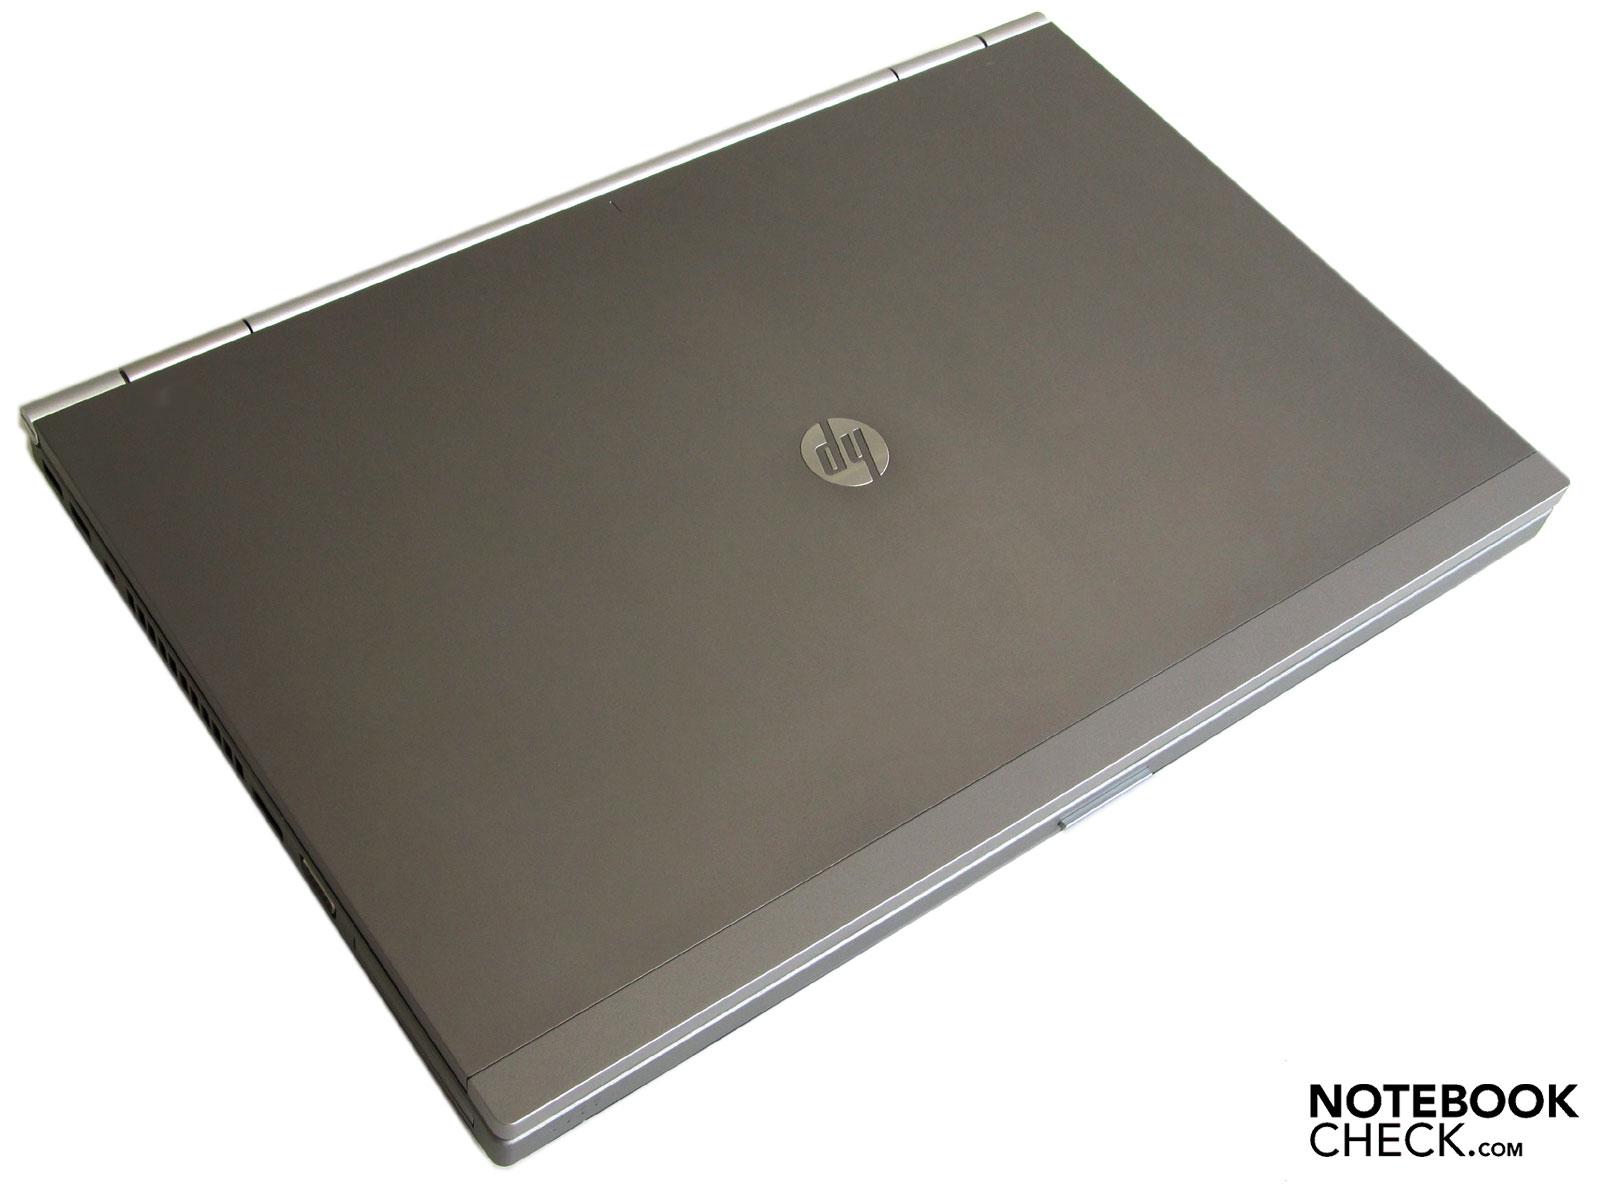 Hp notebook wireless driver - Hp Elitebook 2560p Wireless Driver